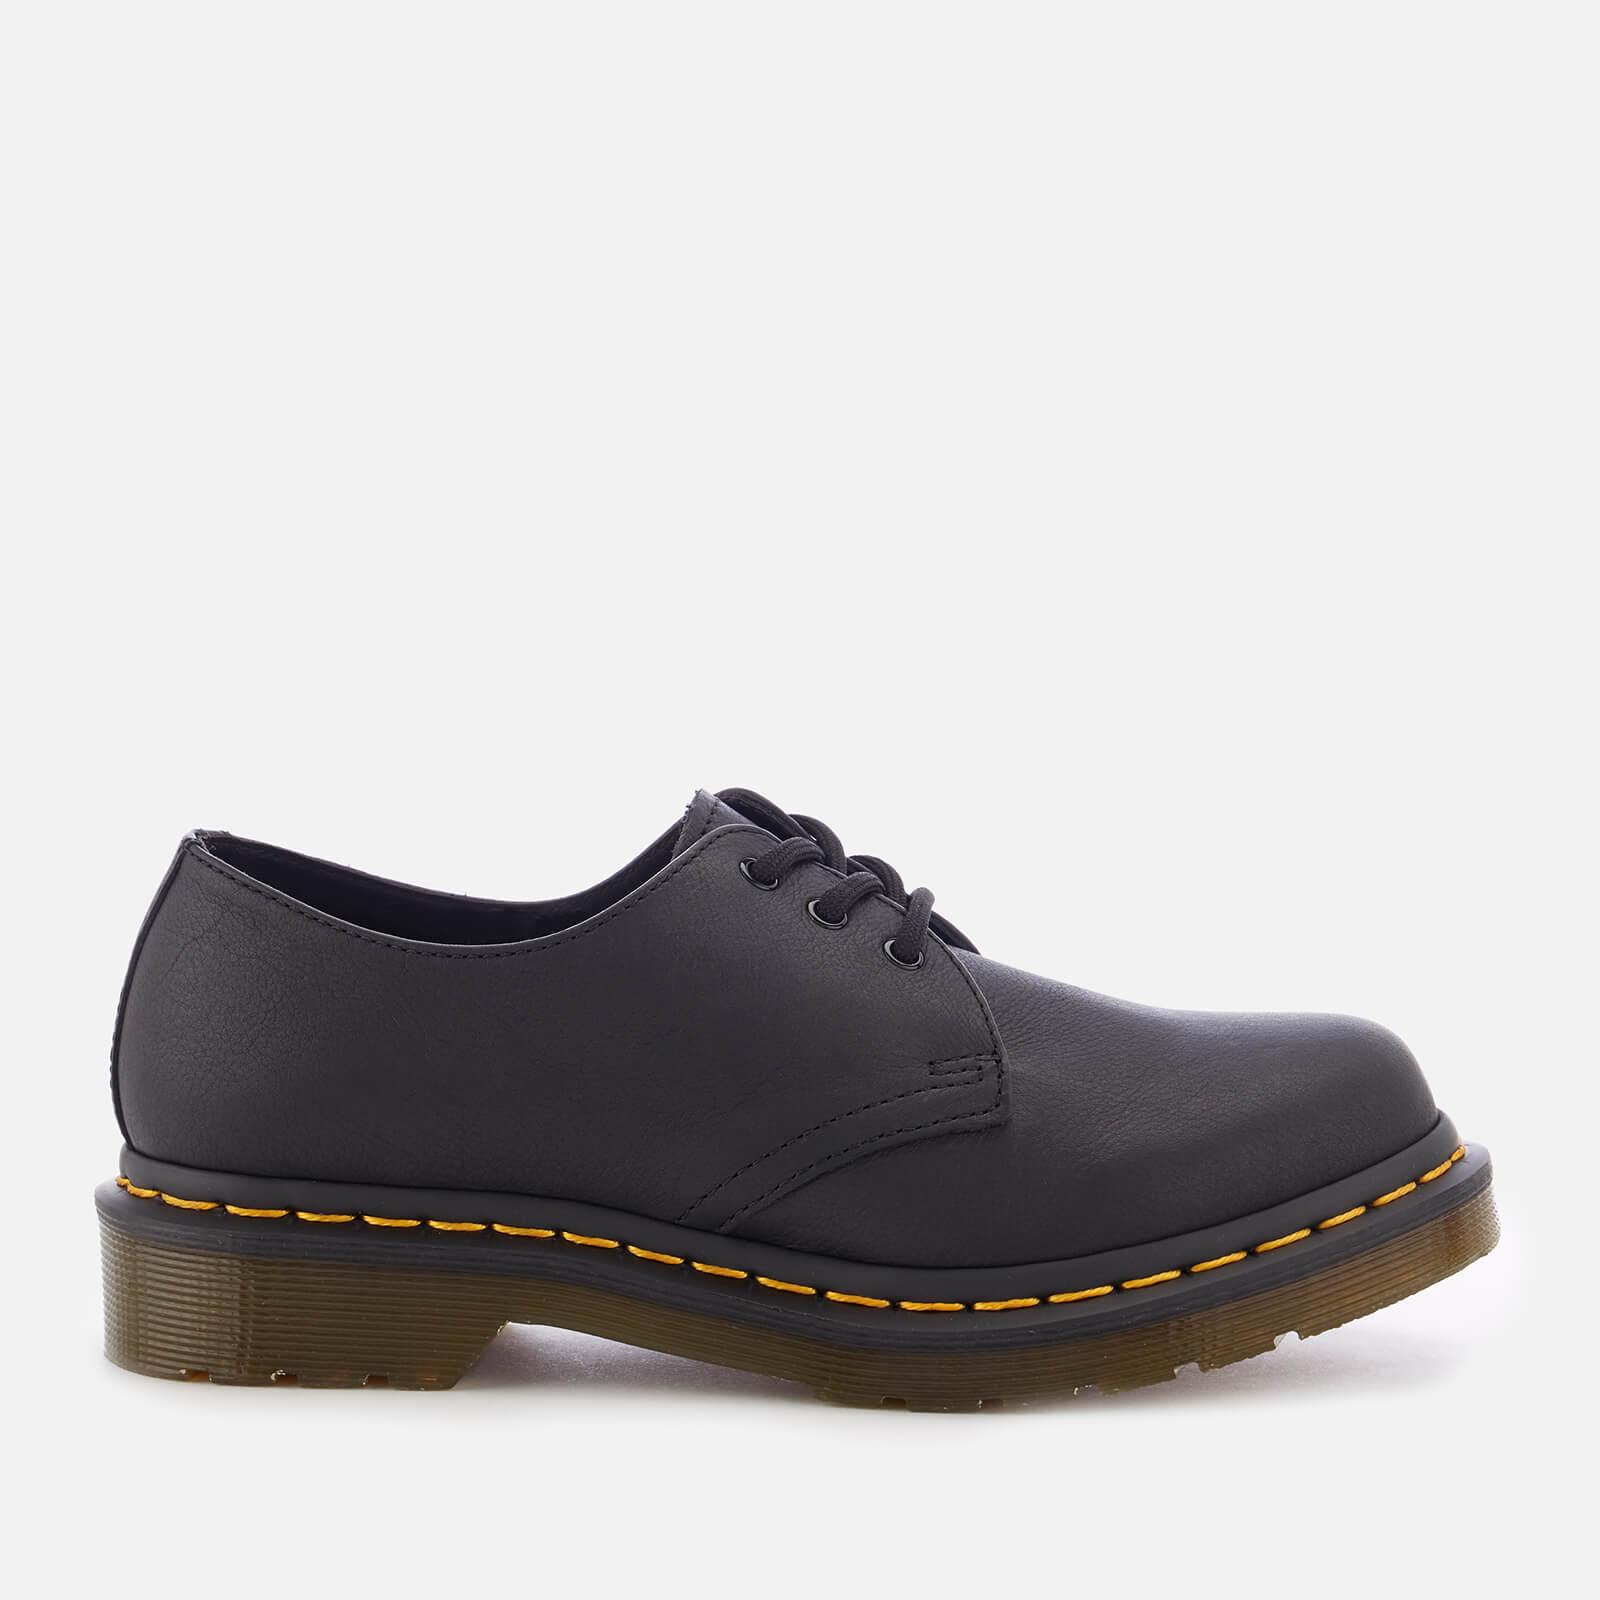 Dr. Martens Women's 1461 W Virginia Leather 3-Eye Shoes - Black - UK 8 - Black